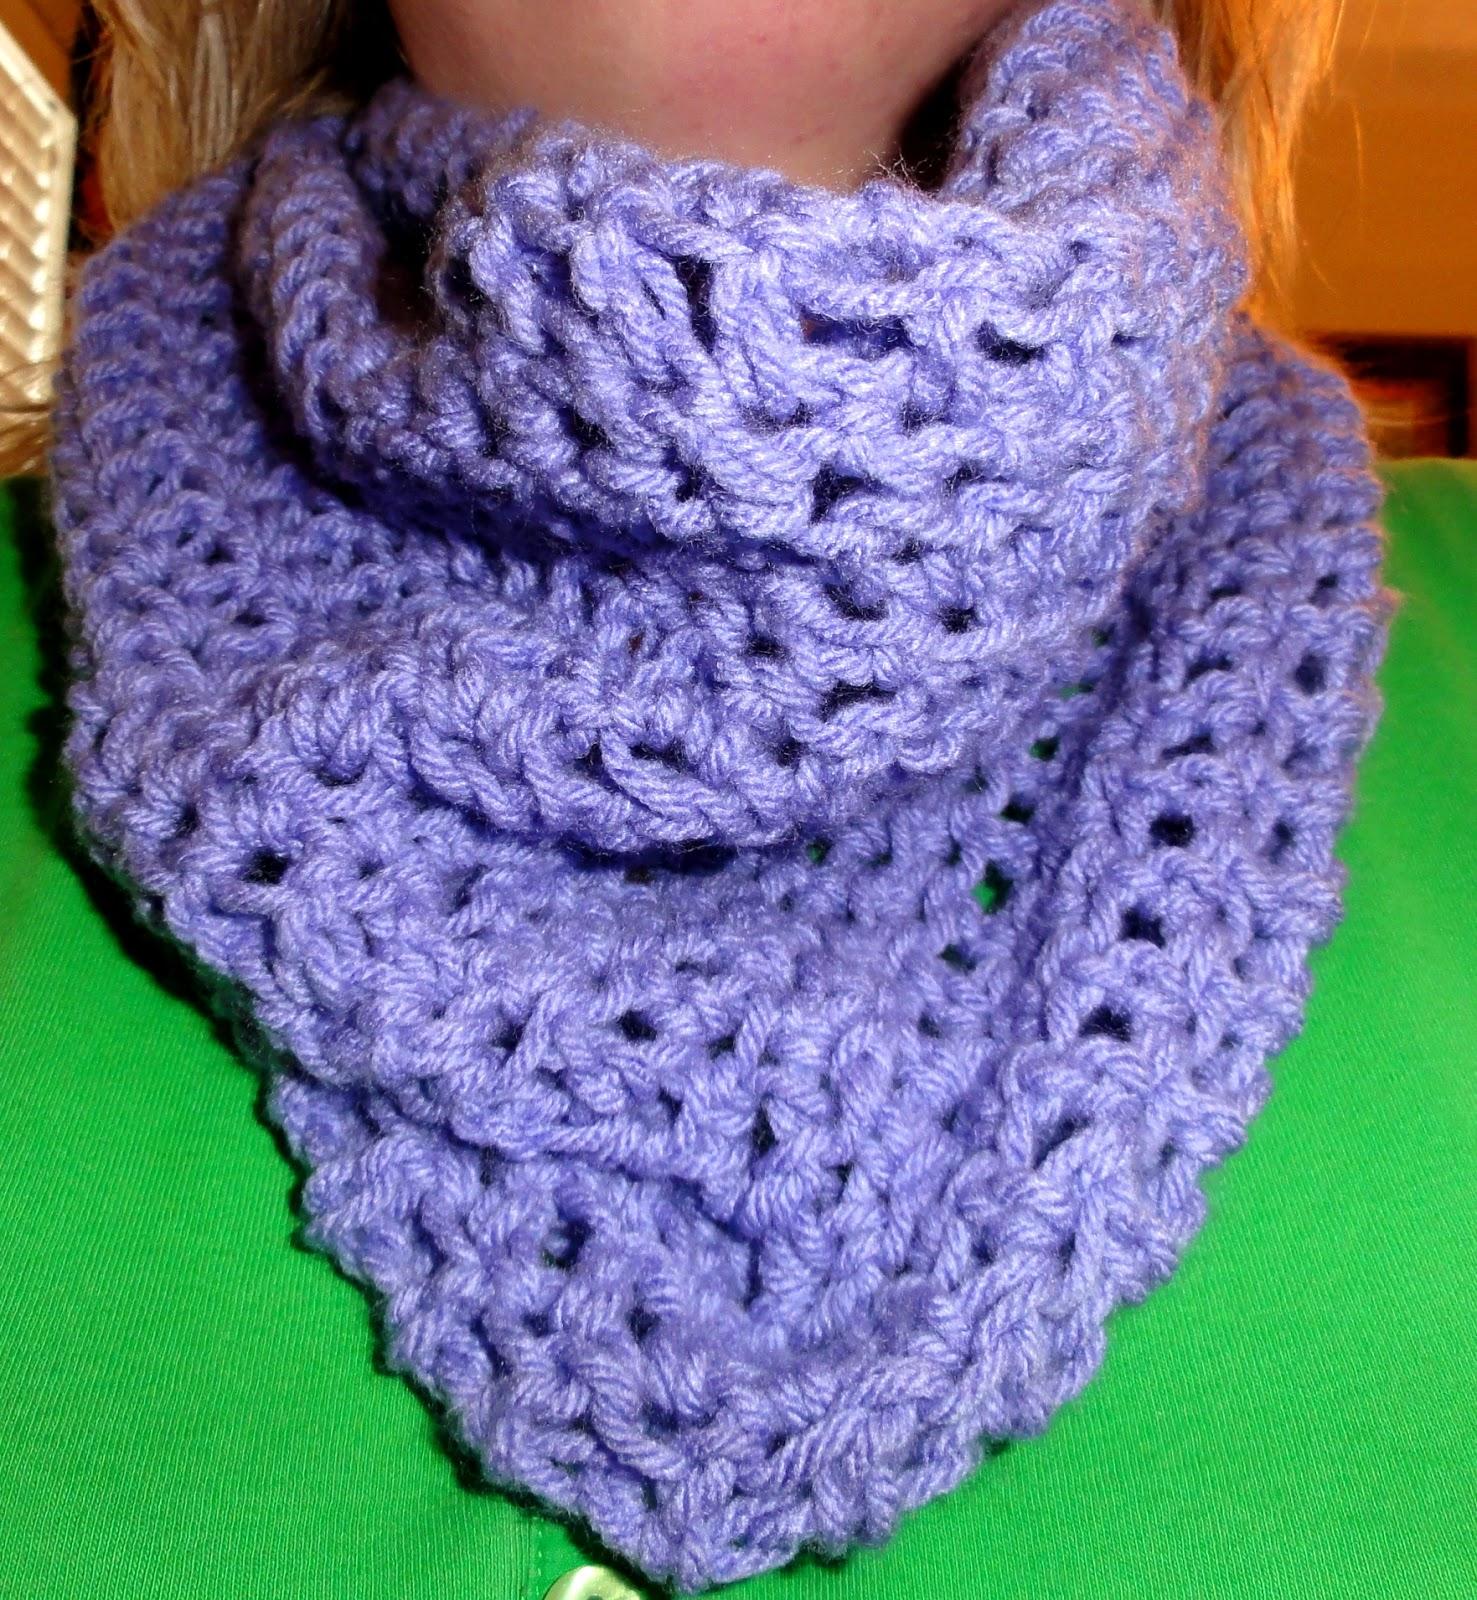 Cheri Quite Contrary: Crochet Convertible Cowl Adventures